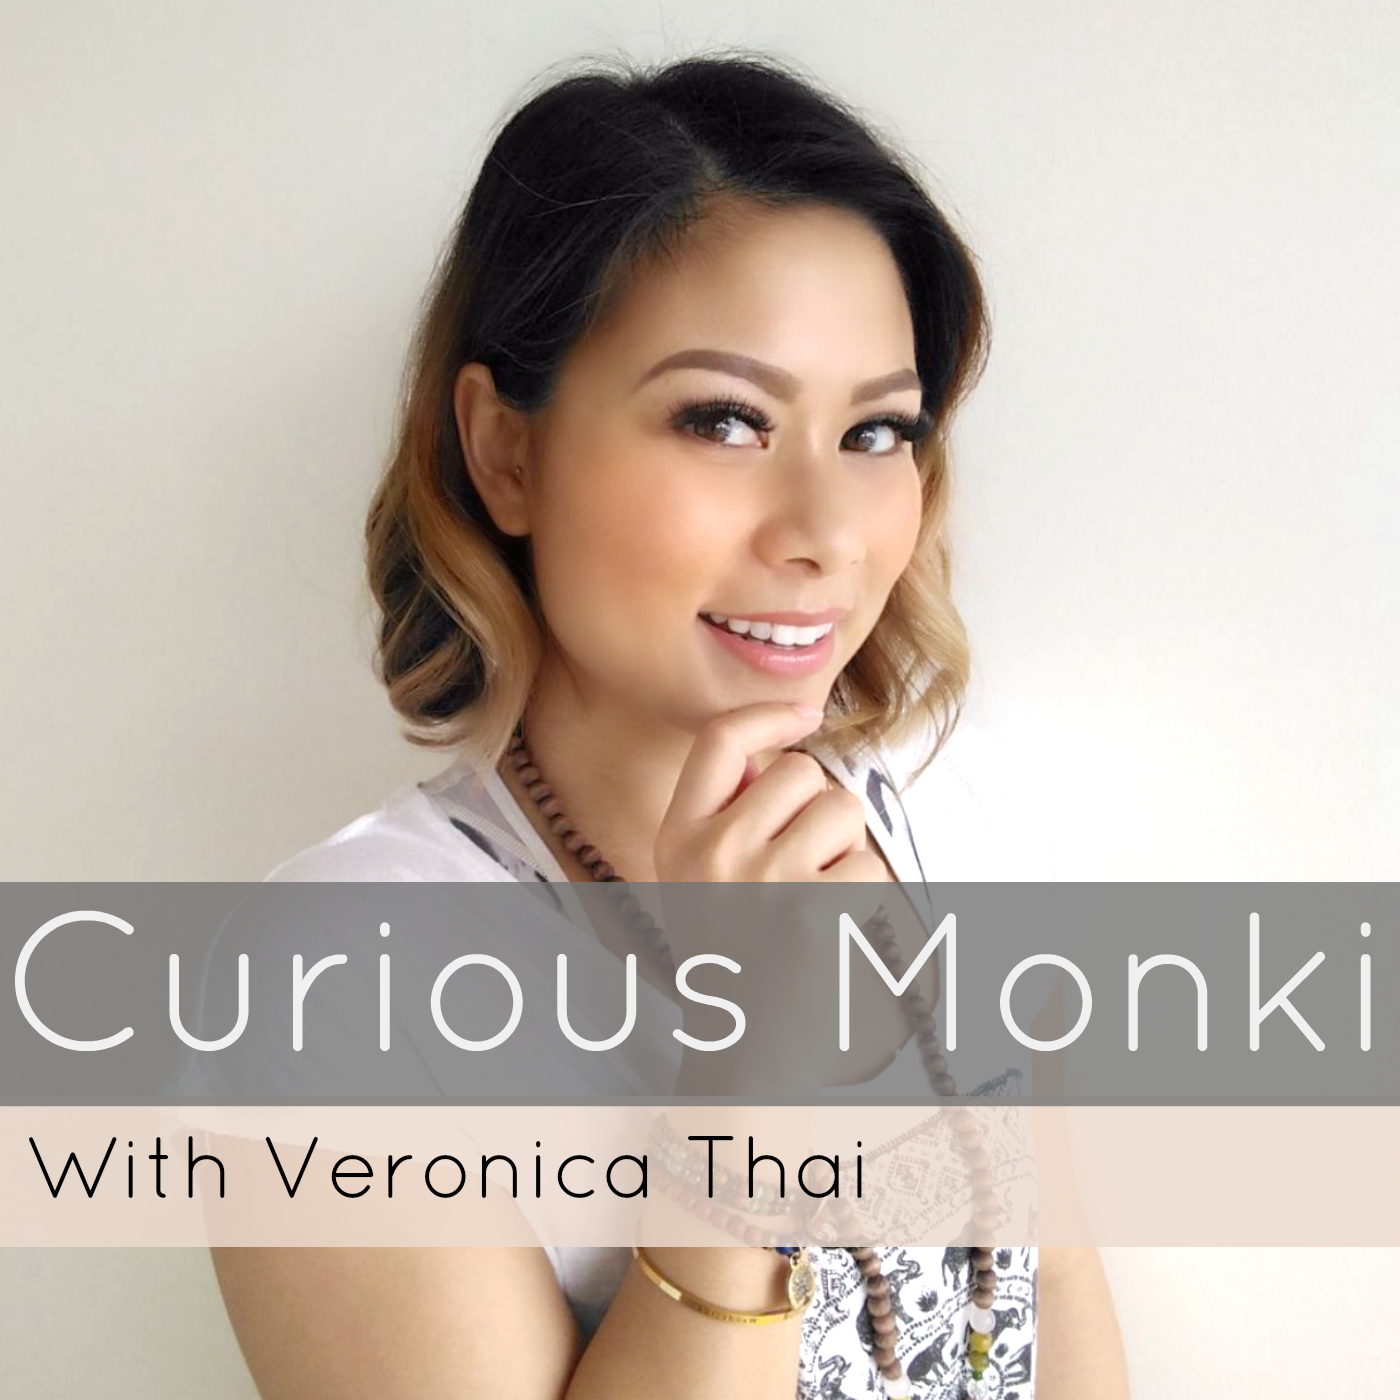 Curious Monki